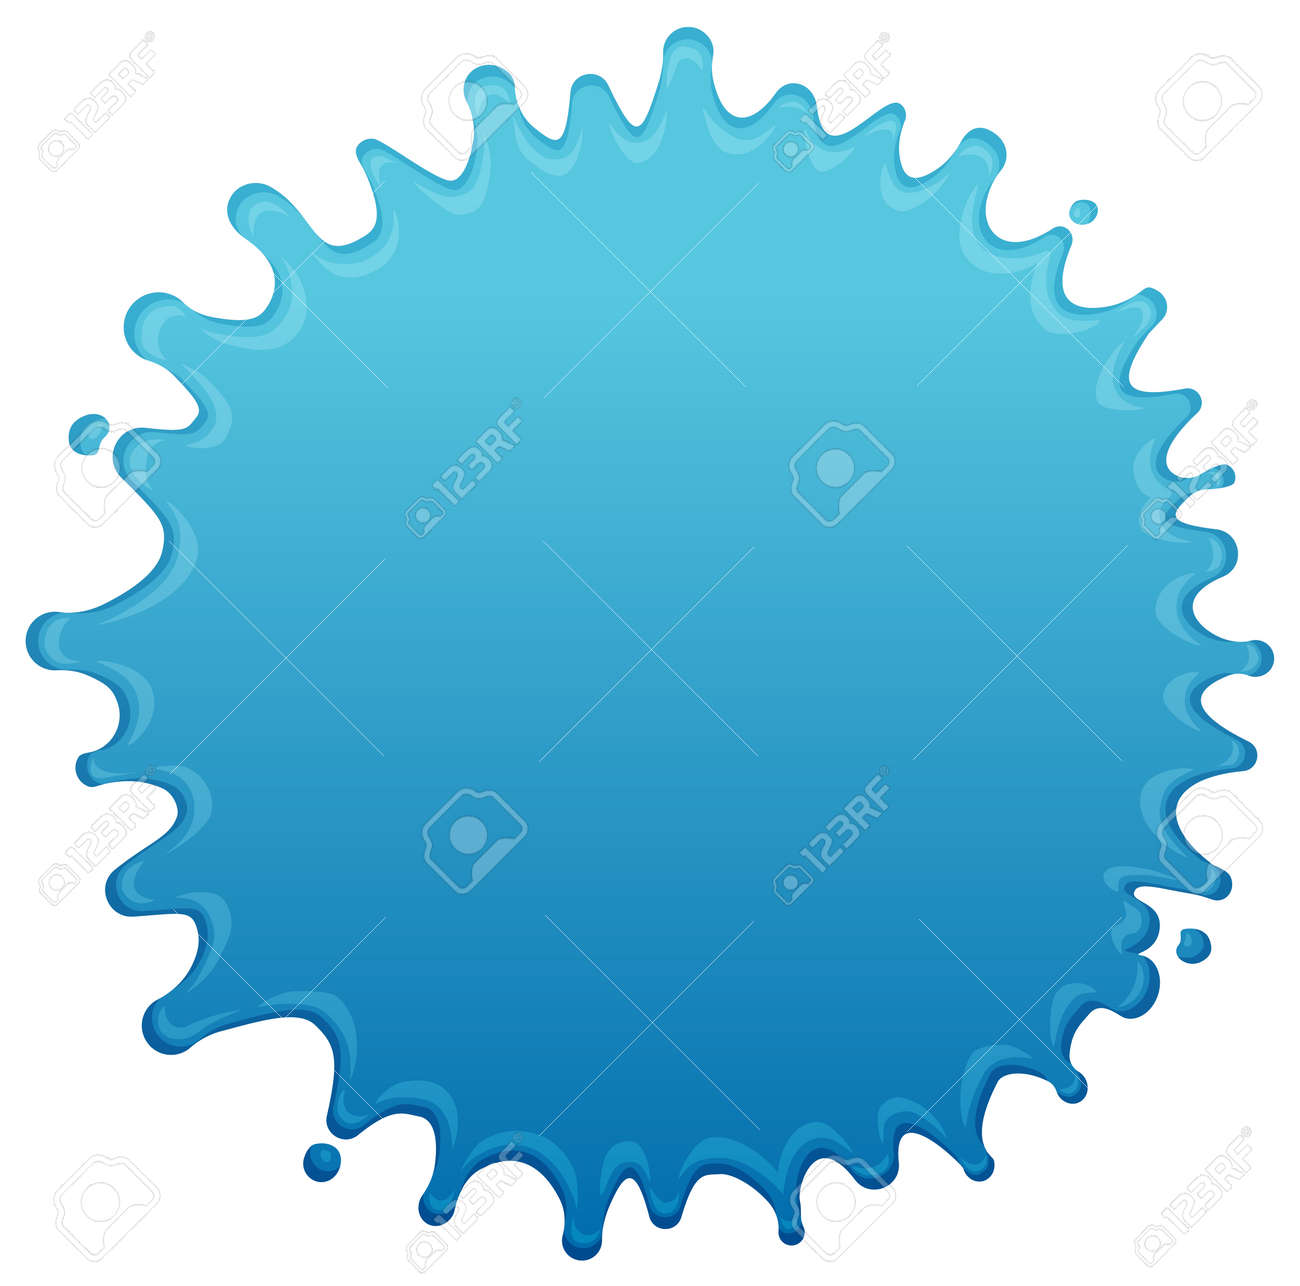 Blue water splash shape vector illustration - 168678839